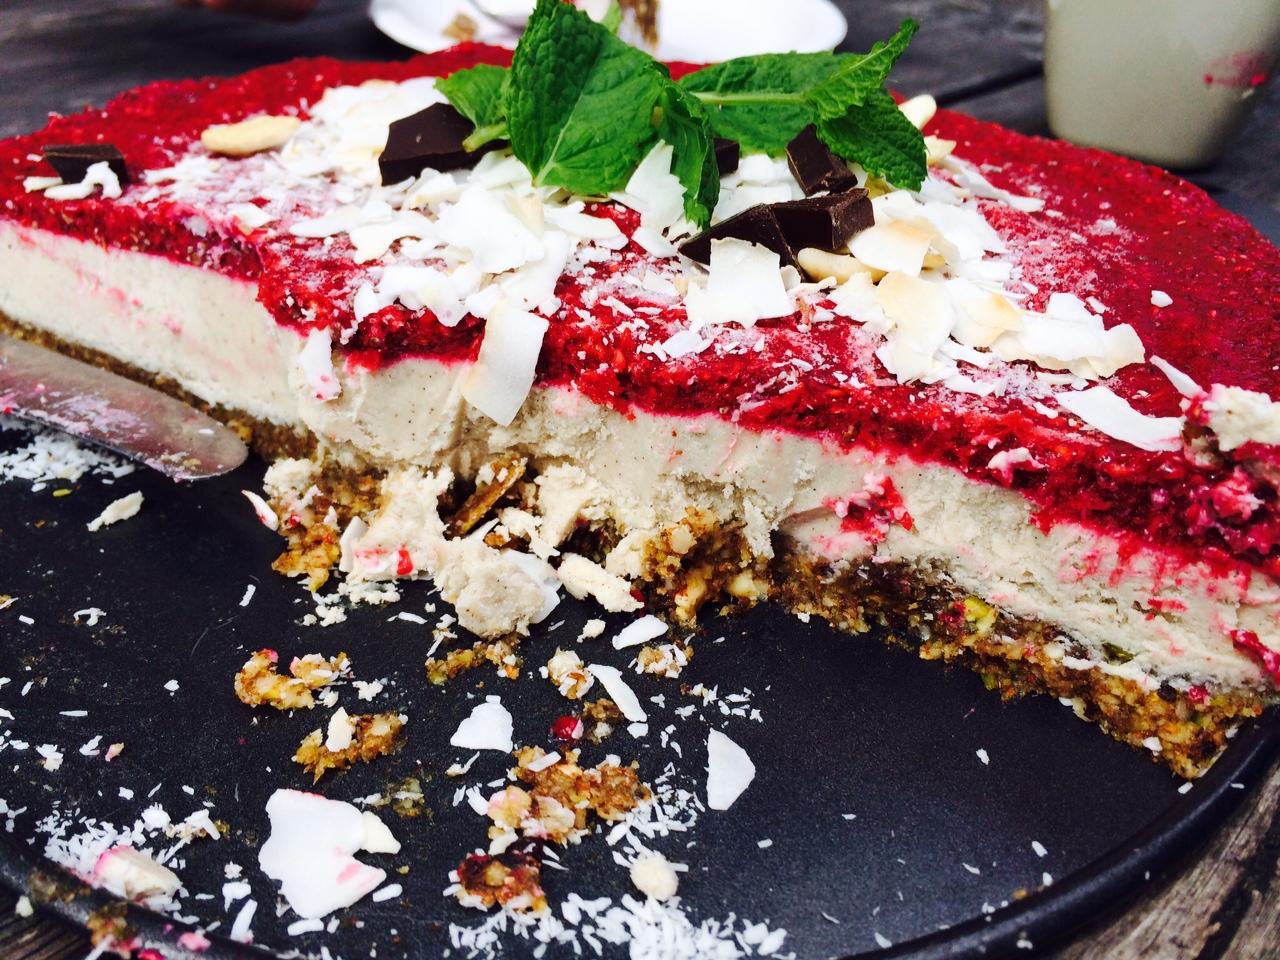 sagolik rawfood tårta recept